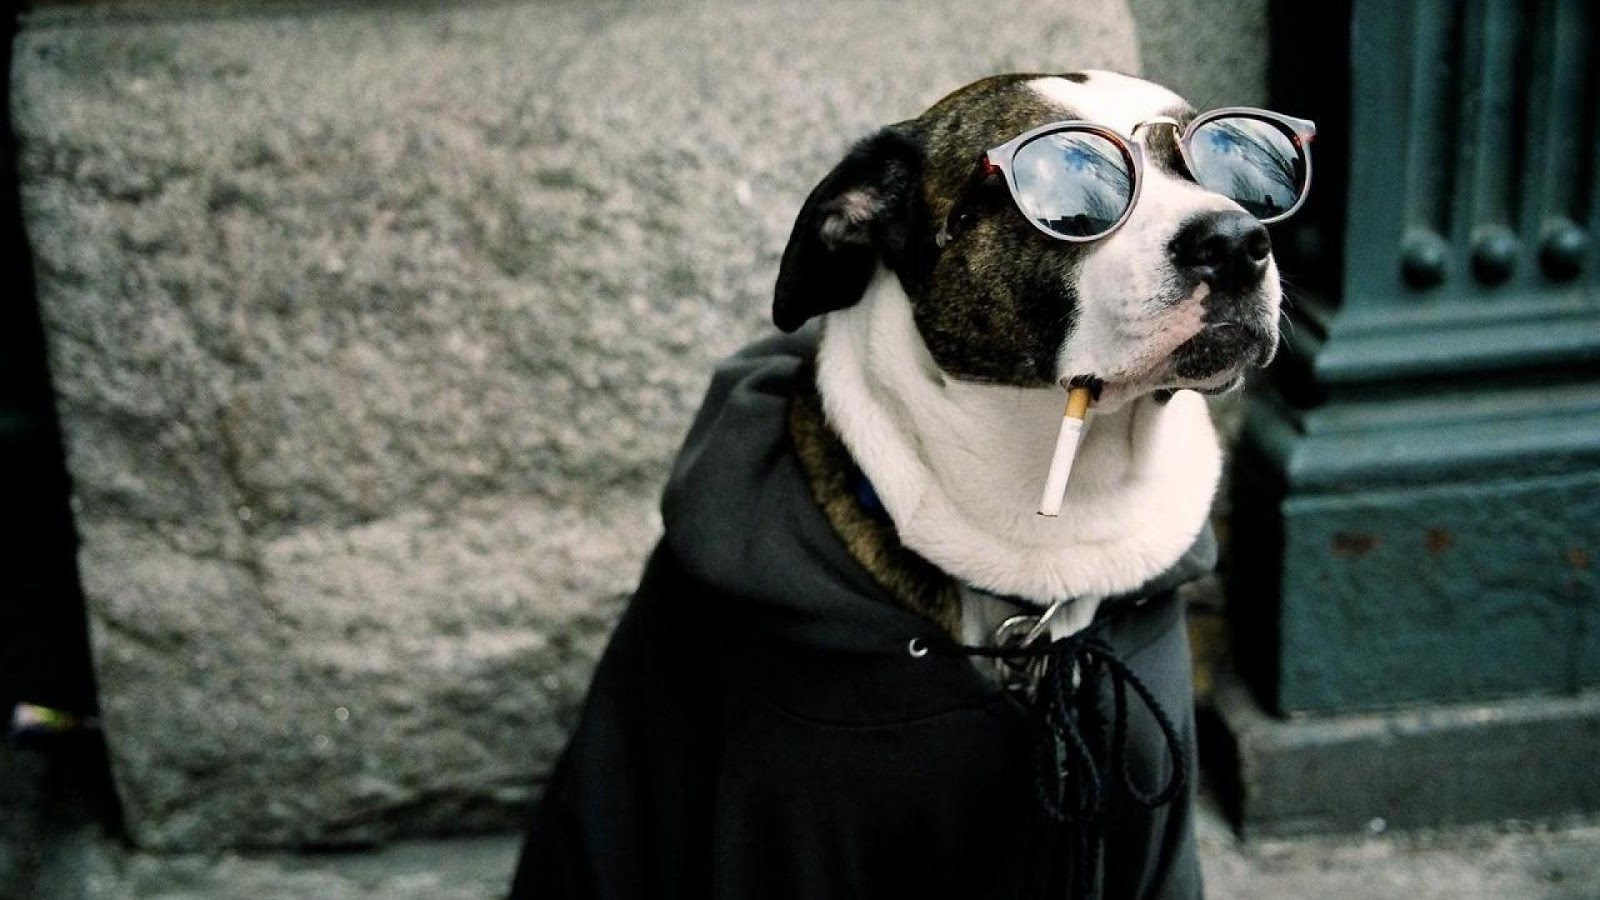 funny dog hd wallpaper - photo #1